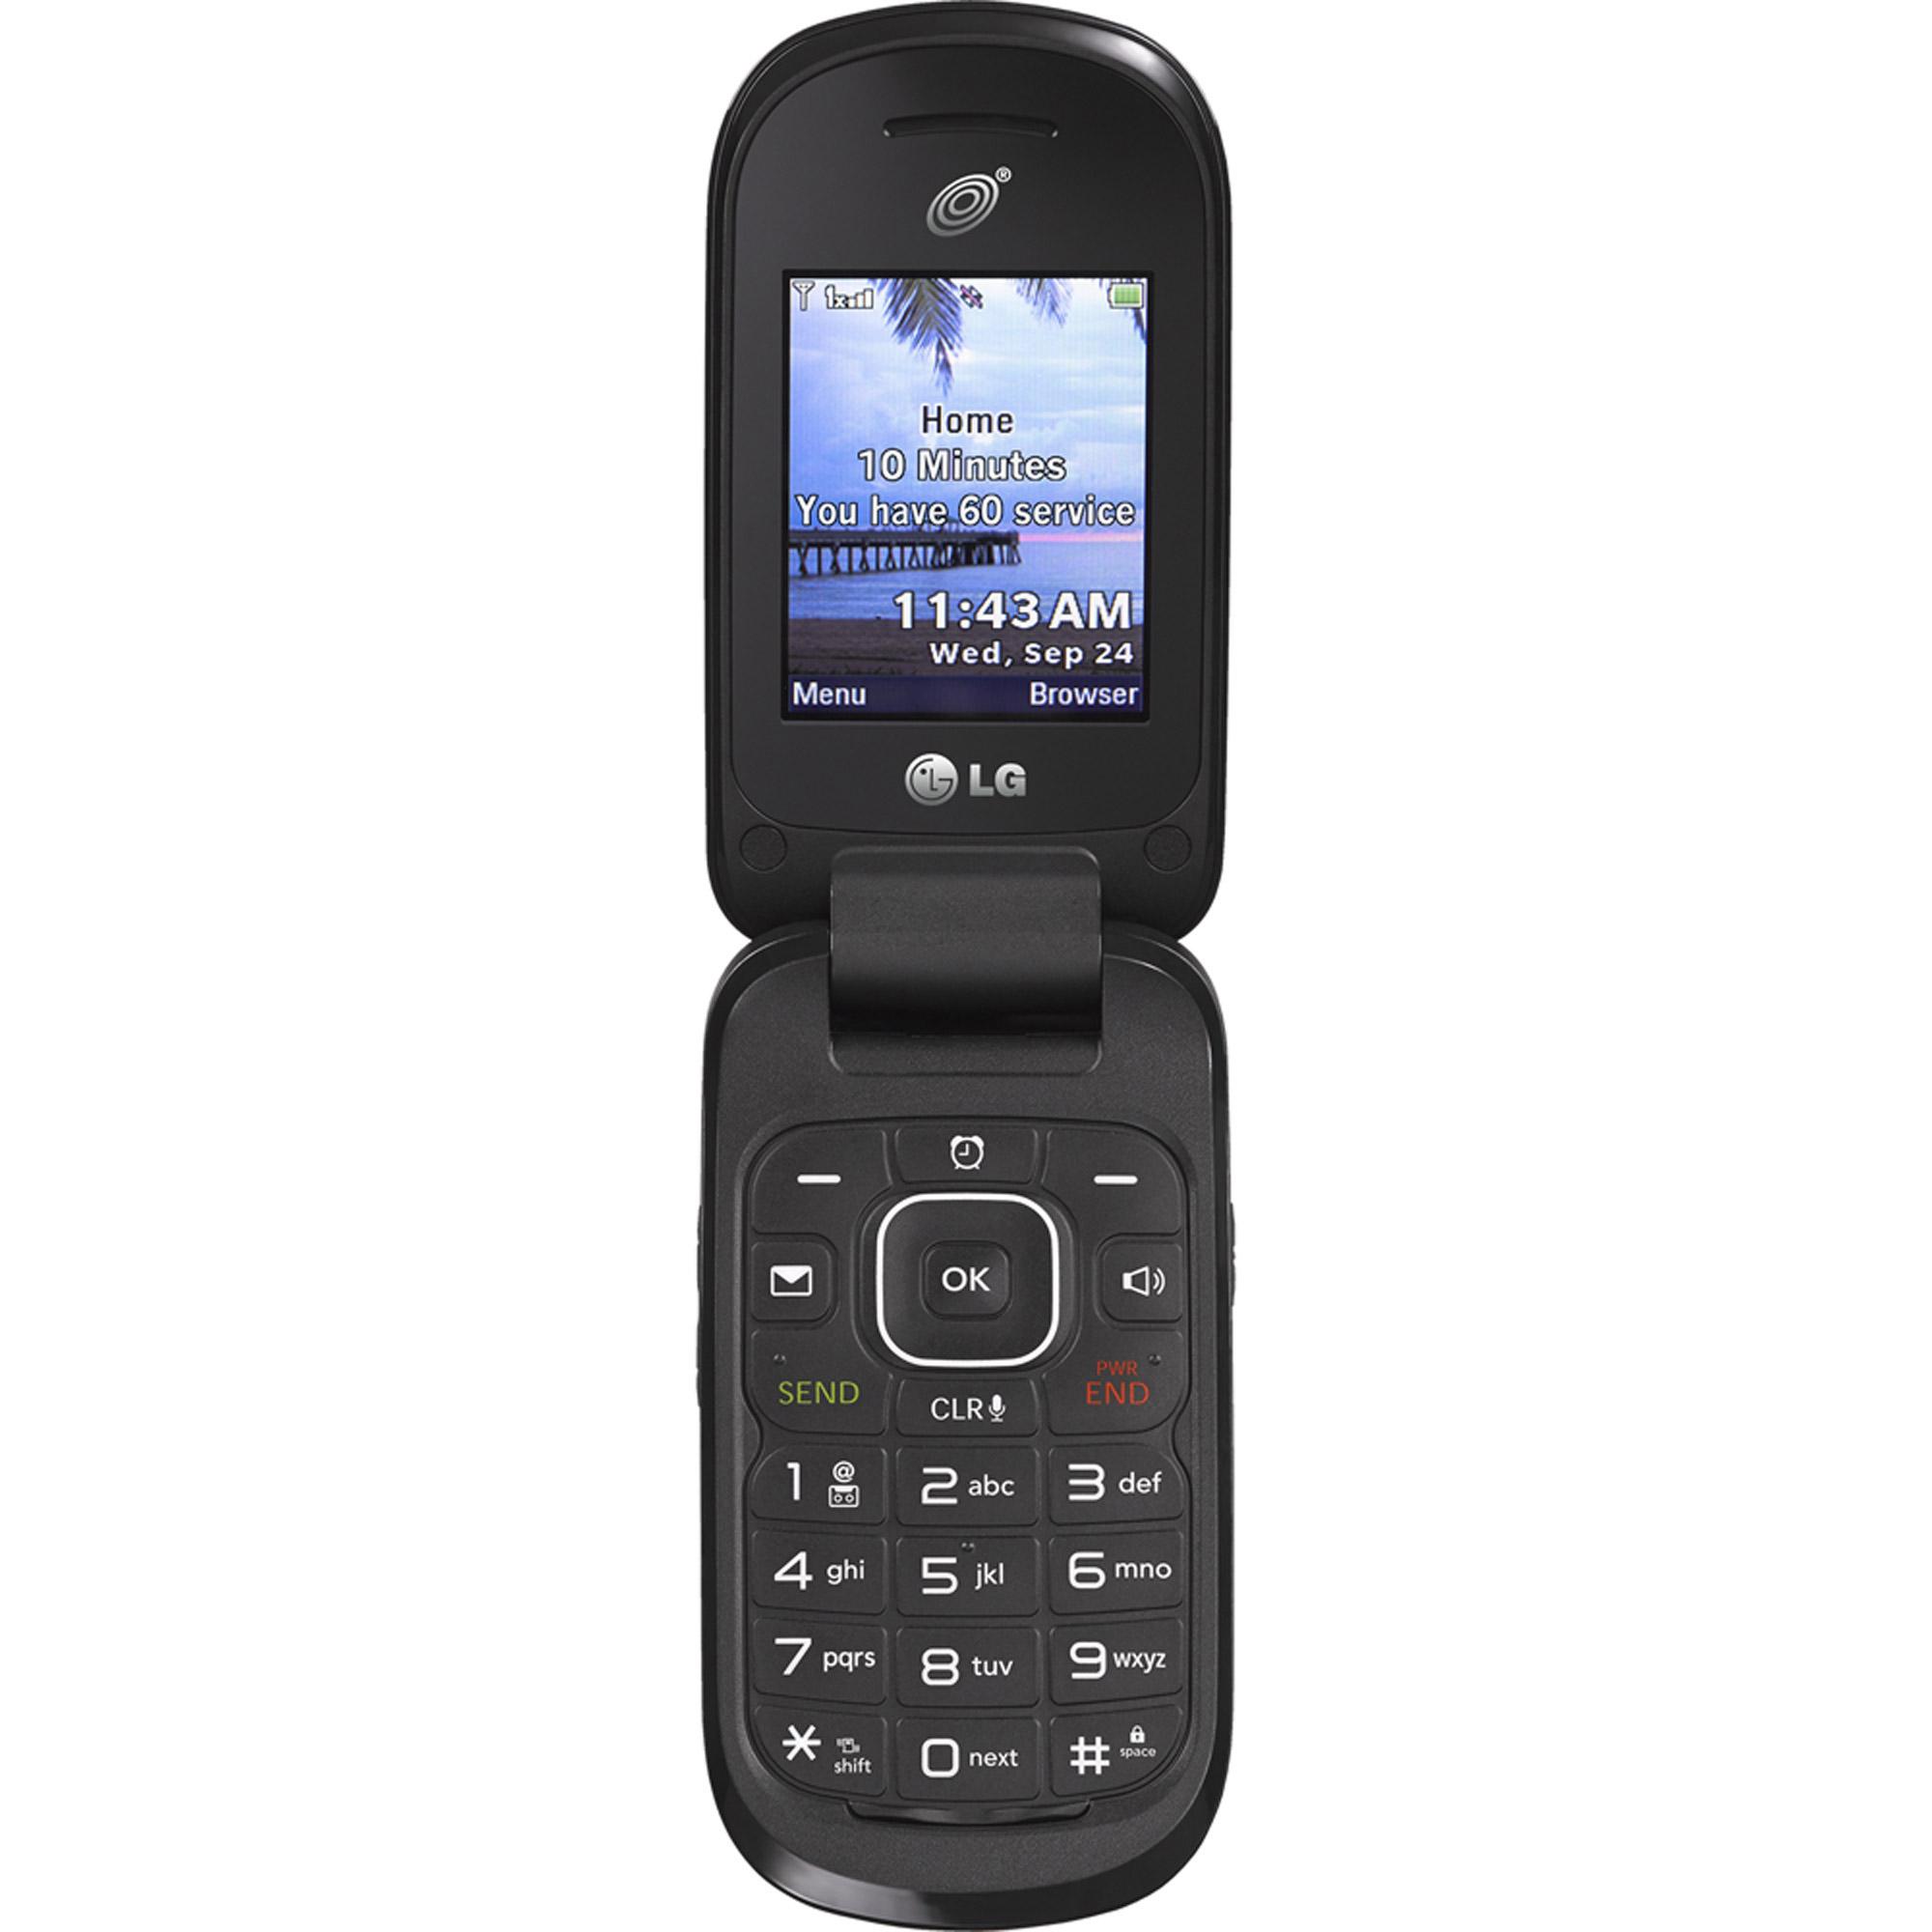 Phone Backgrounds, Compatible - PC, Mobile, Gadgets  2000x2000 px